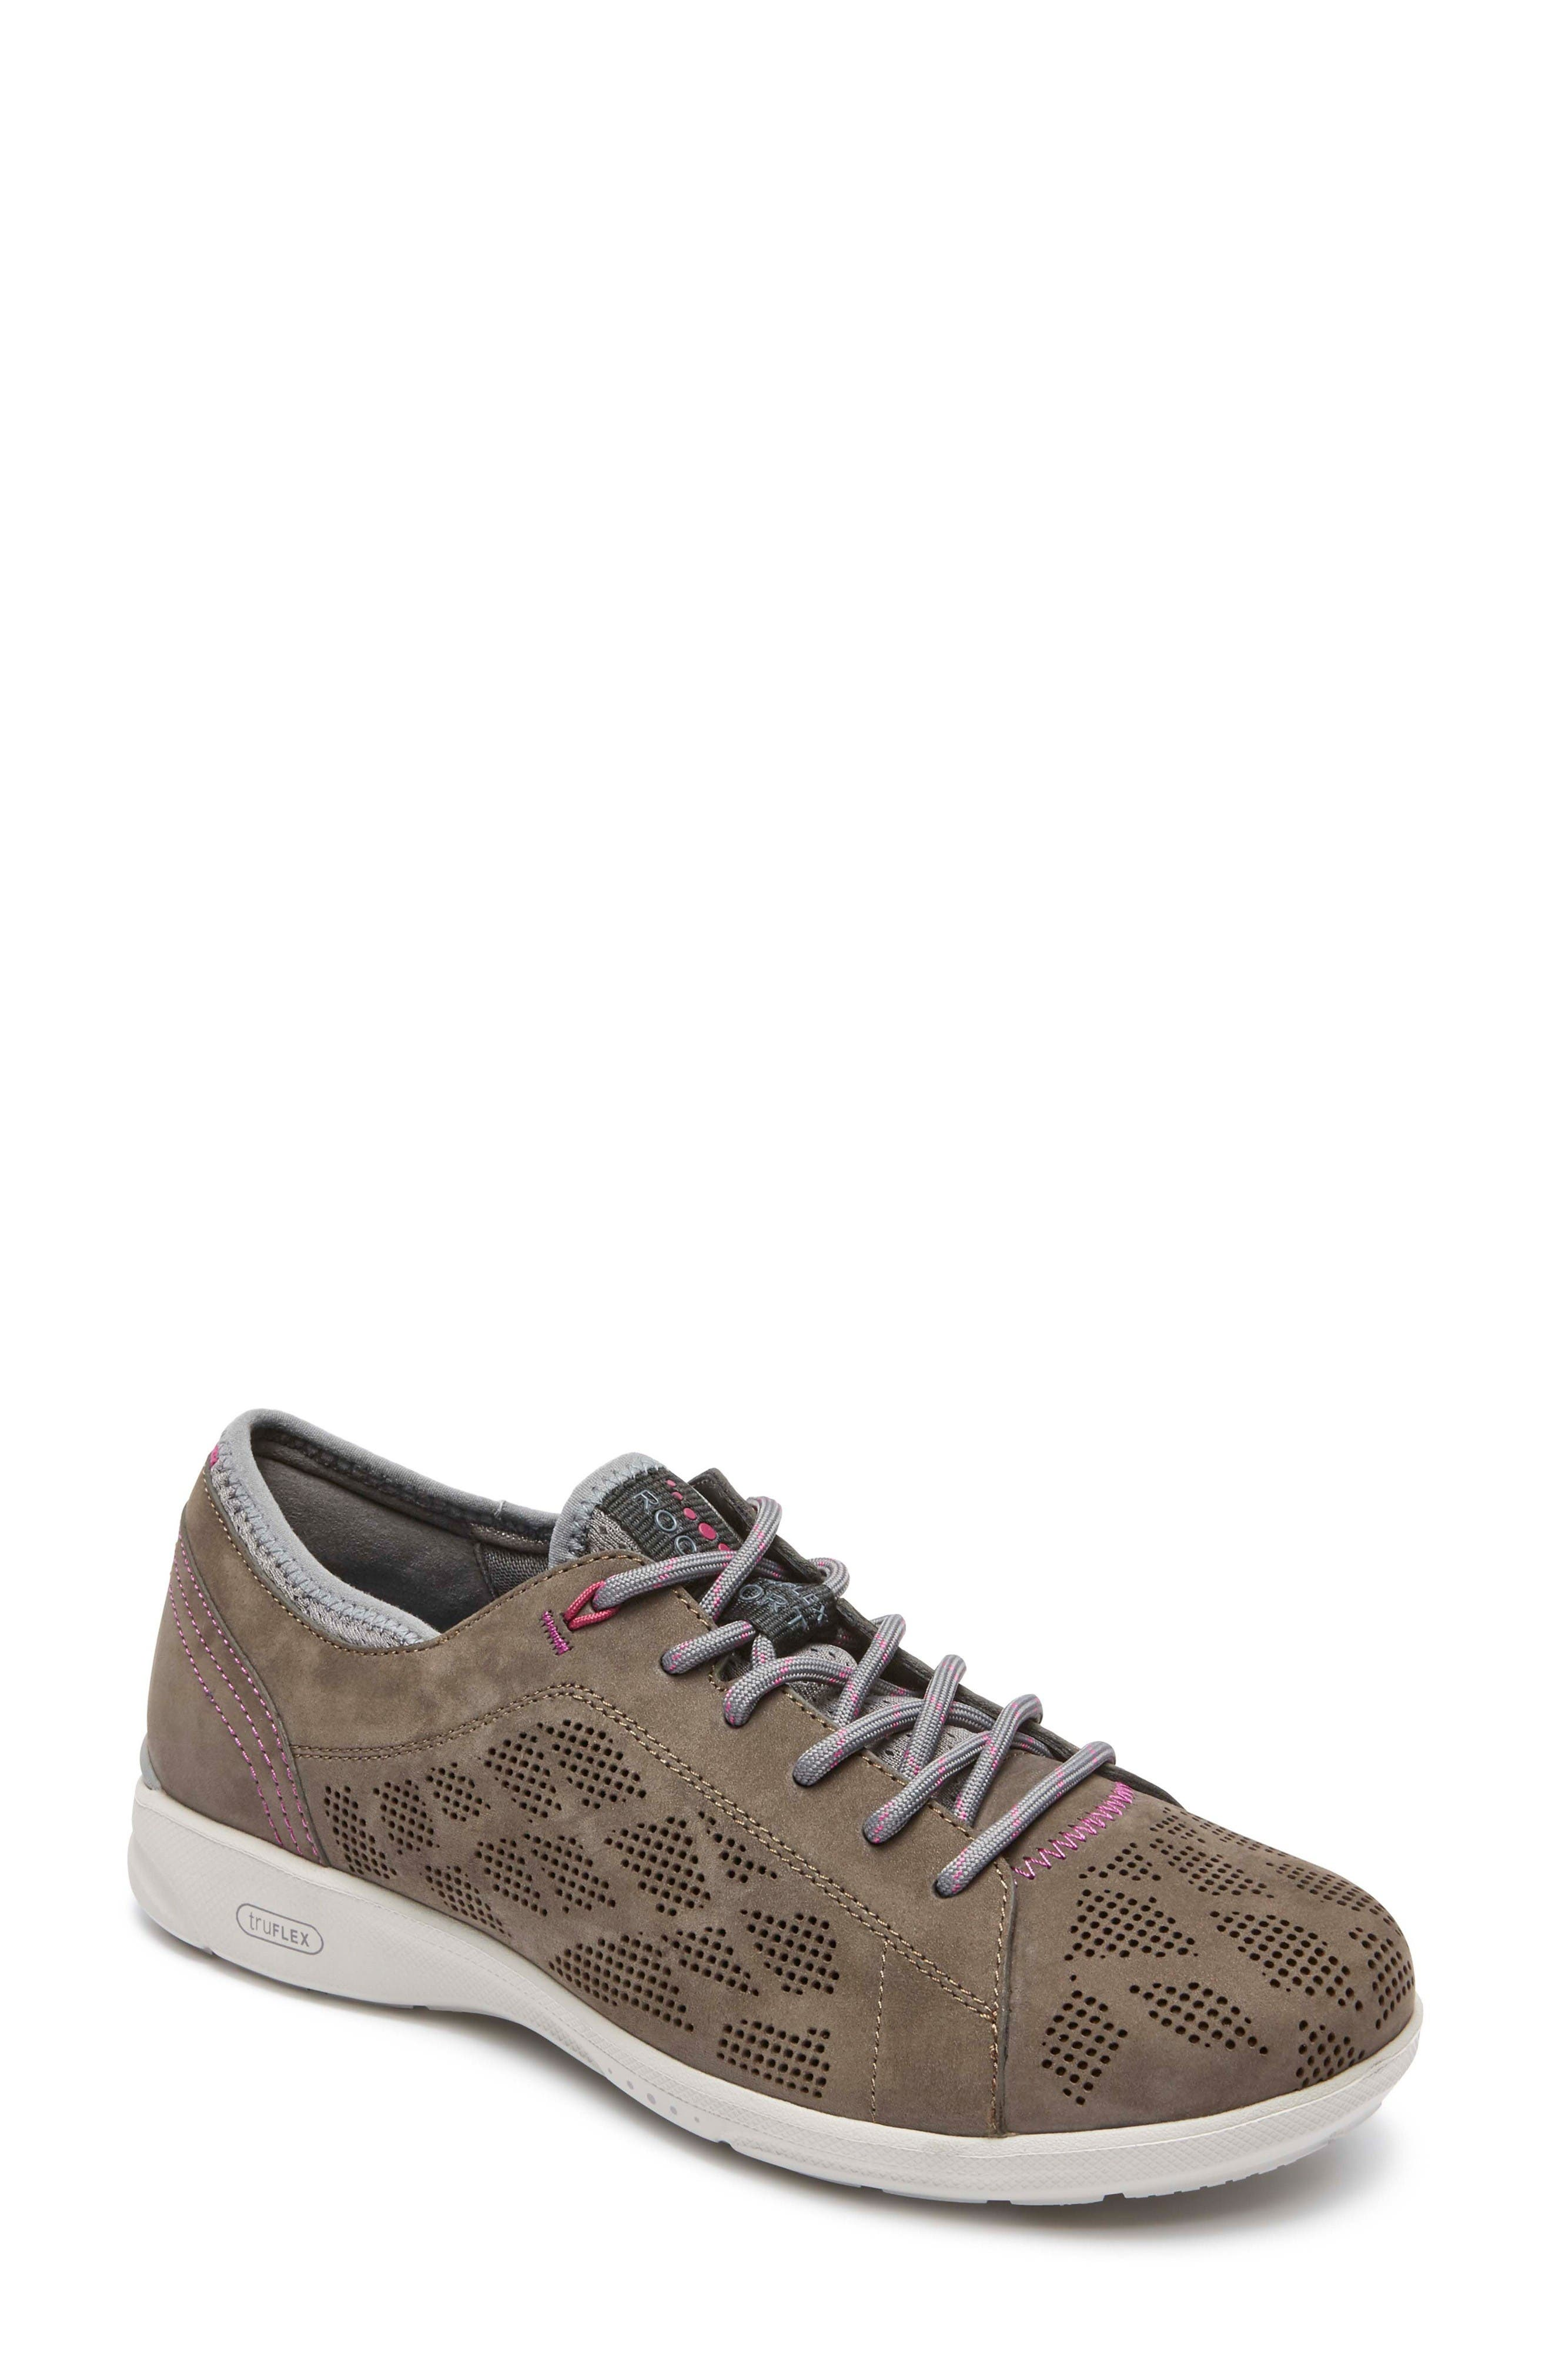 Rockport truFLEX Perforated Sneaker (Women)